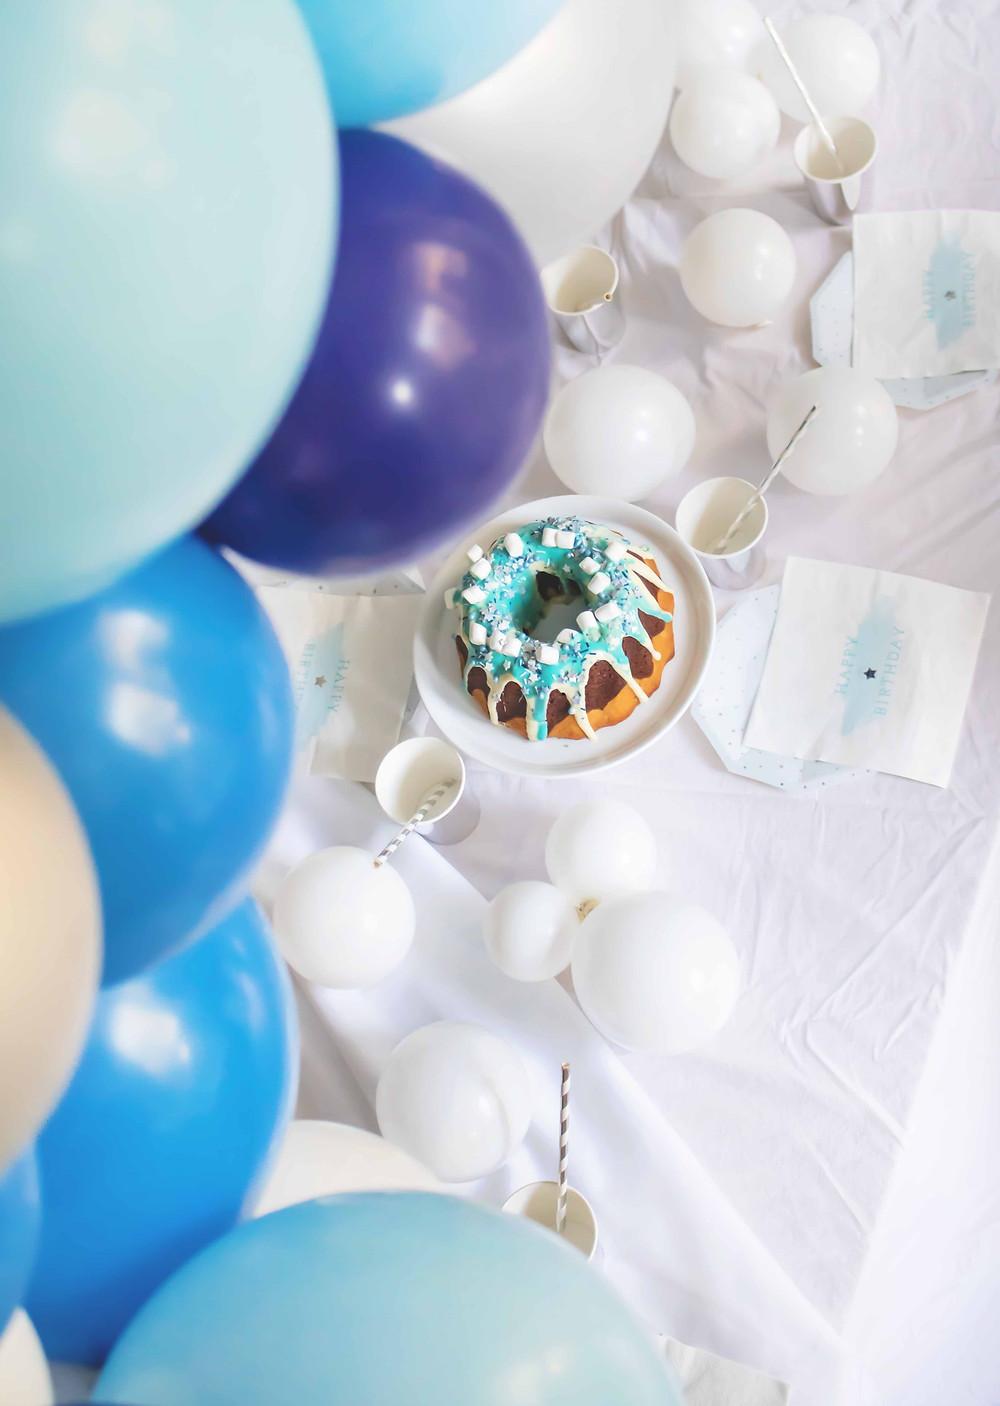 EisPrinzessin, Frozen, Elsa, Elsa-Party, Mottoparty, Kindergeburtstag, Mädchengeburtstag, Kinderdeko, Partydeko, Geburtstagsdeko